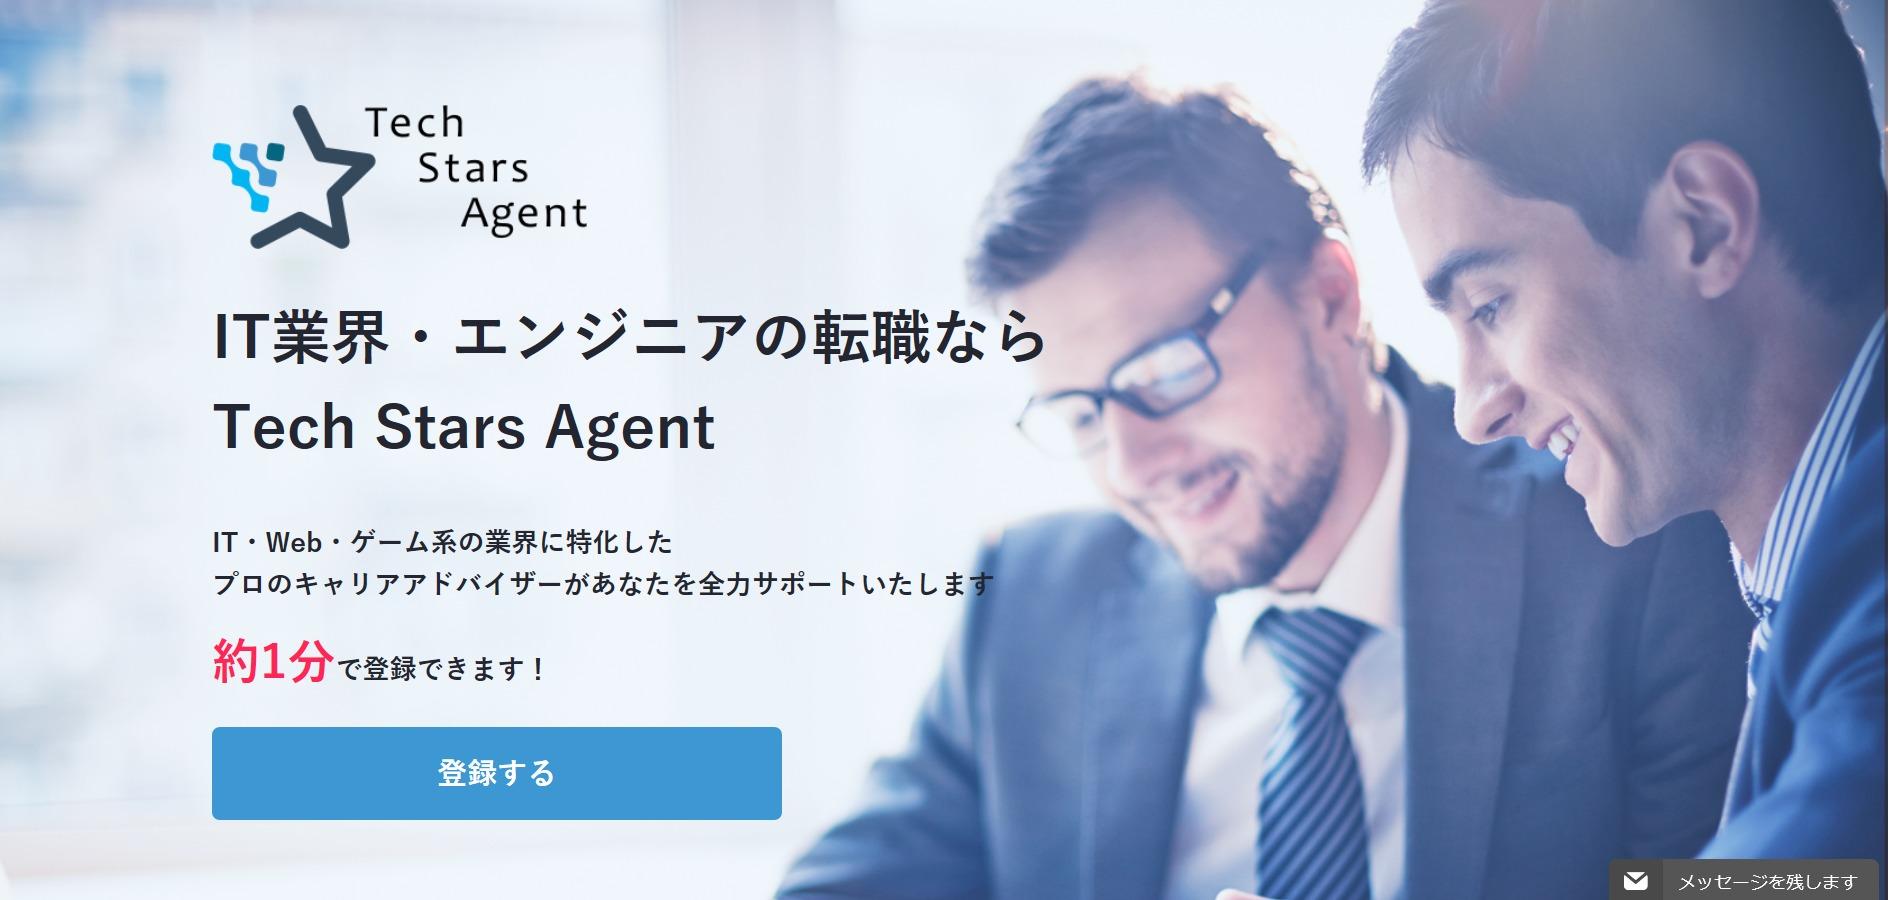 TechStarsAgent公式ページの画像